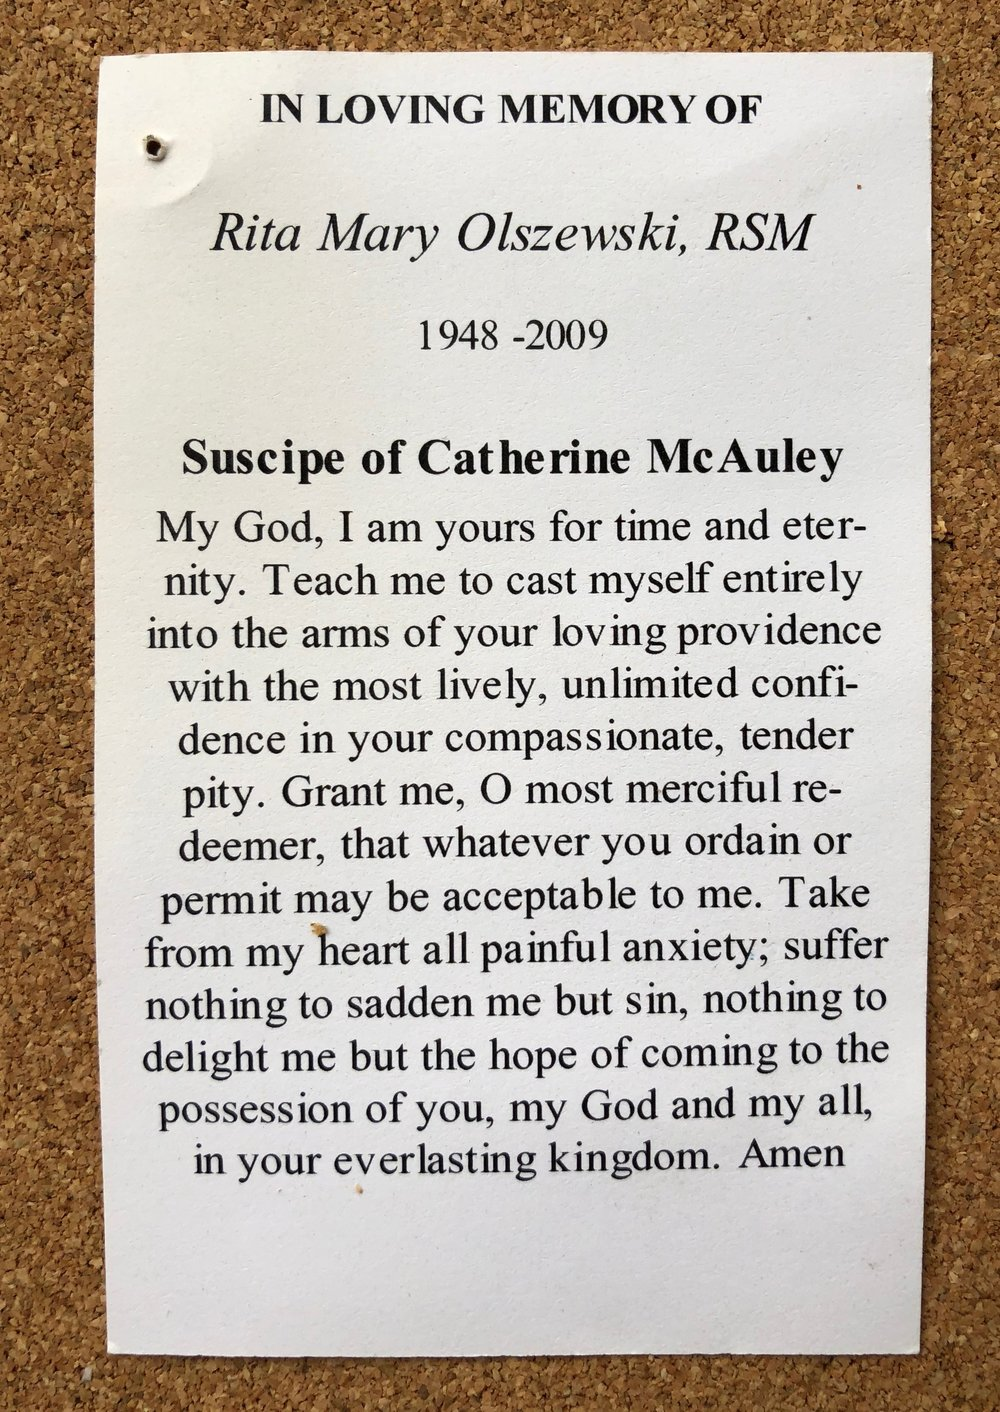 Card from Sister Rita Mary Olszewski's funeral.